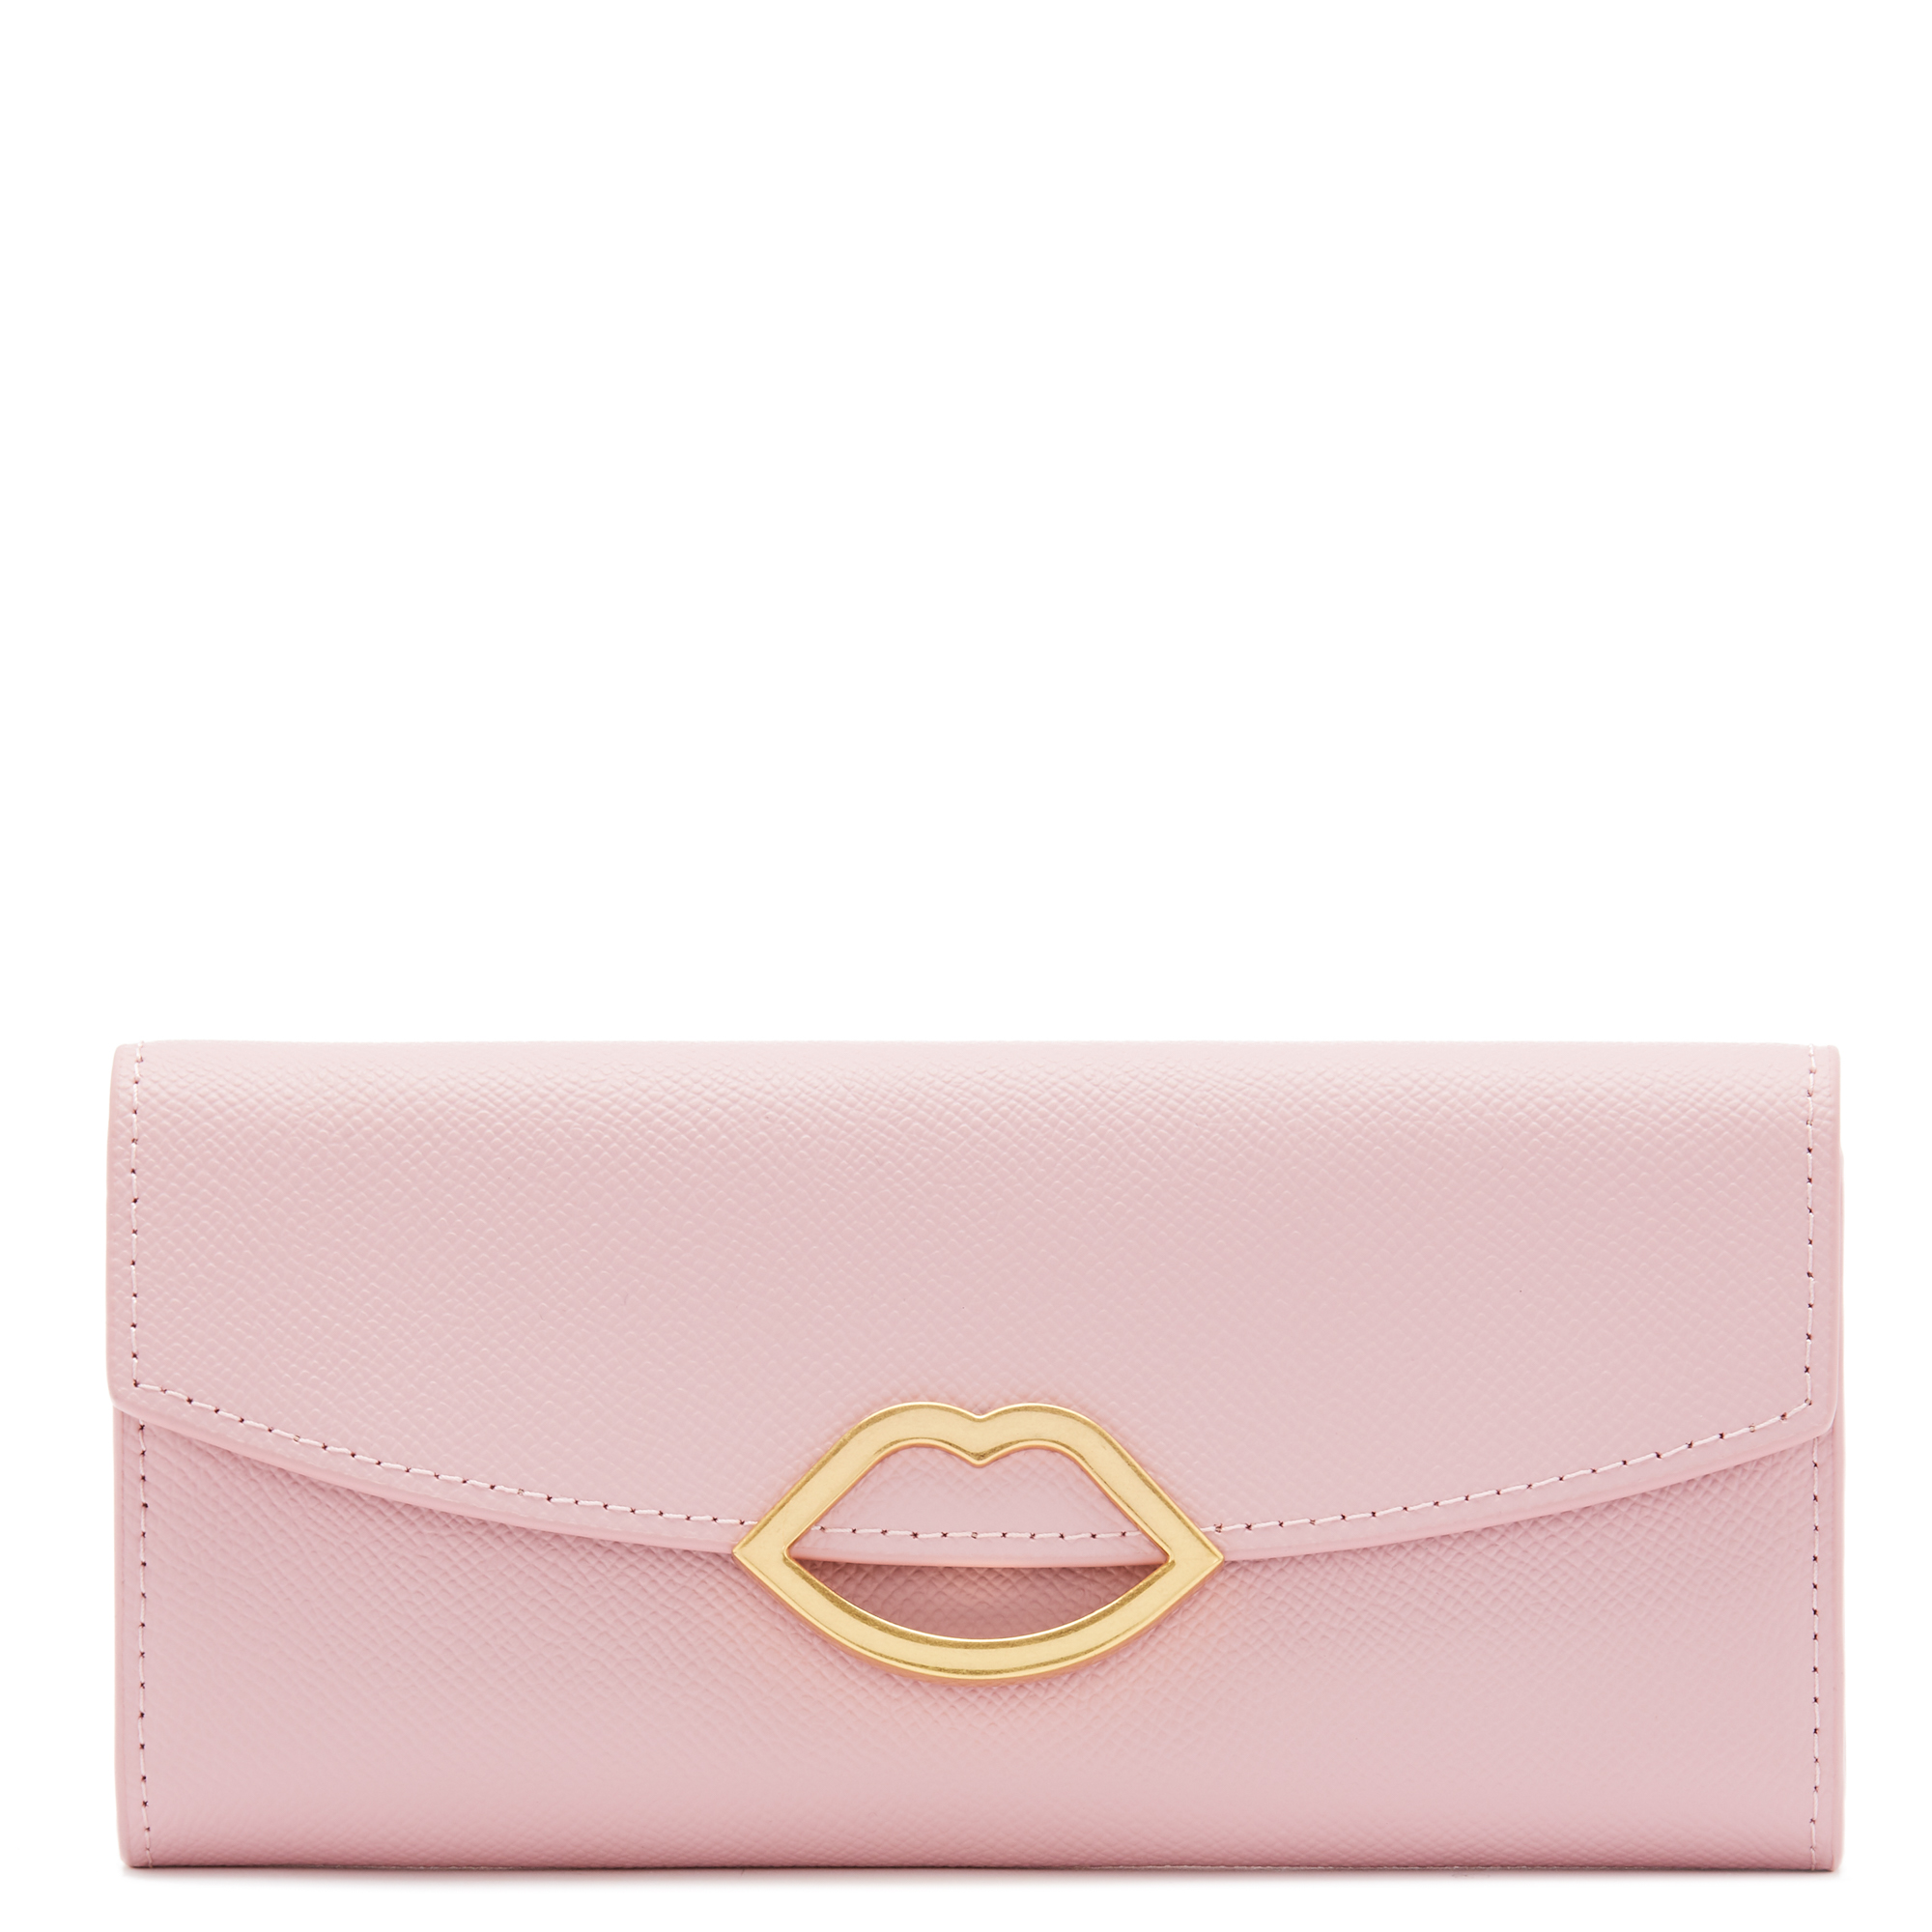 Blossom Leather Cut Out Lip Trisha Wallet